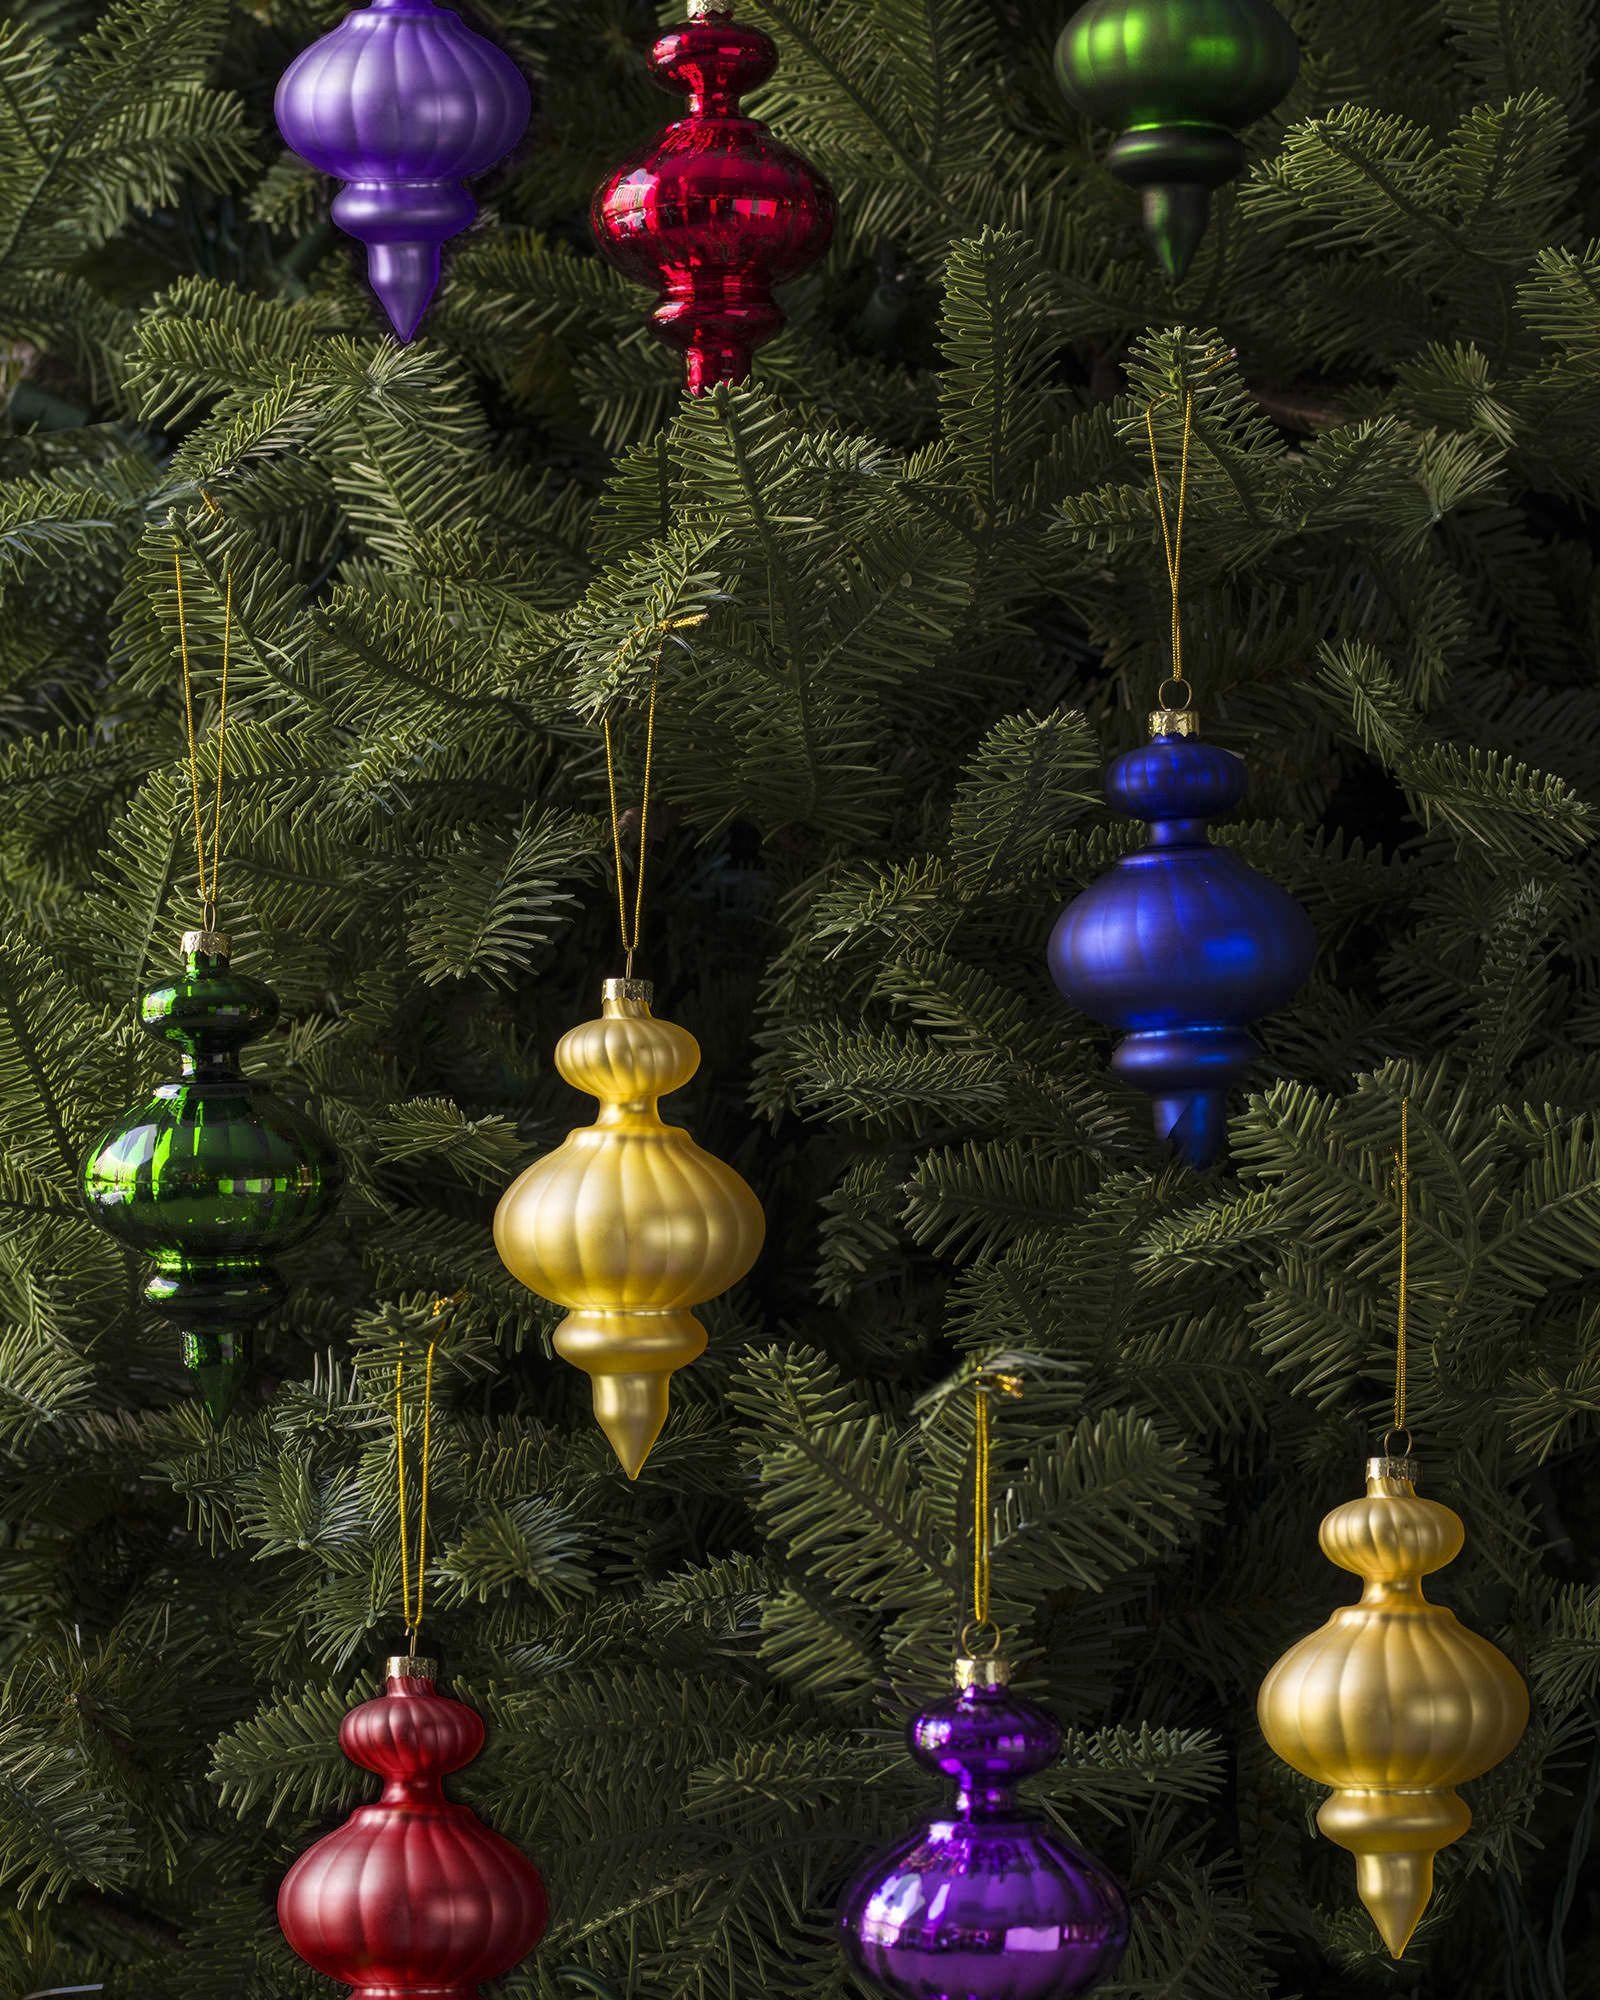 Balsam hill s finial ornament set adds vibrant solid hues